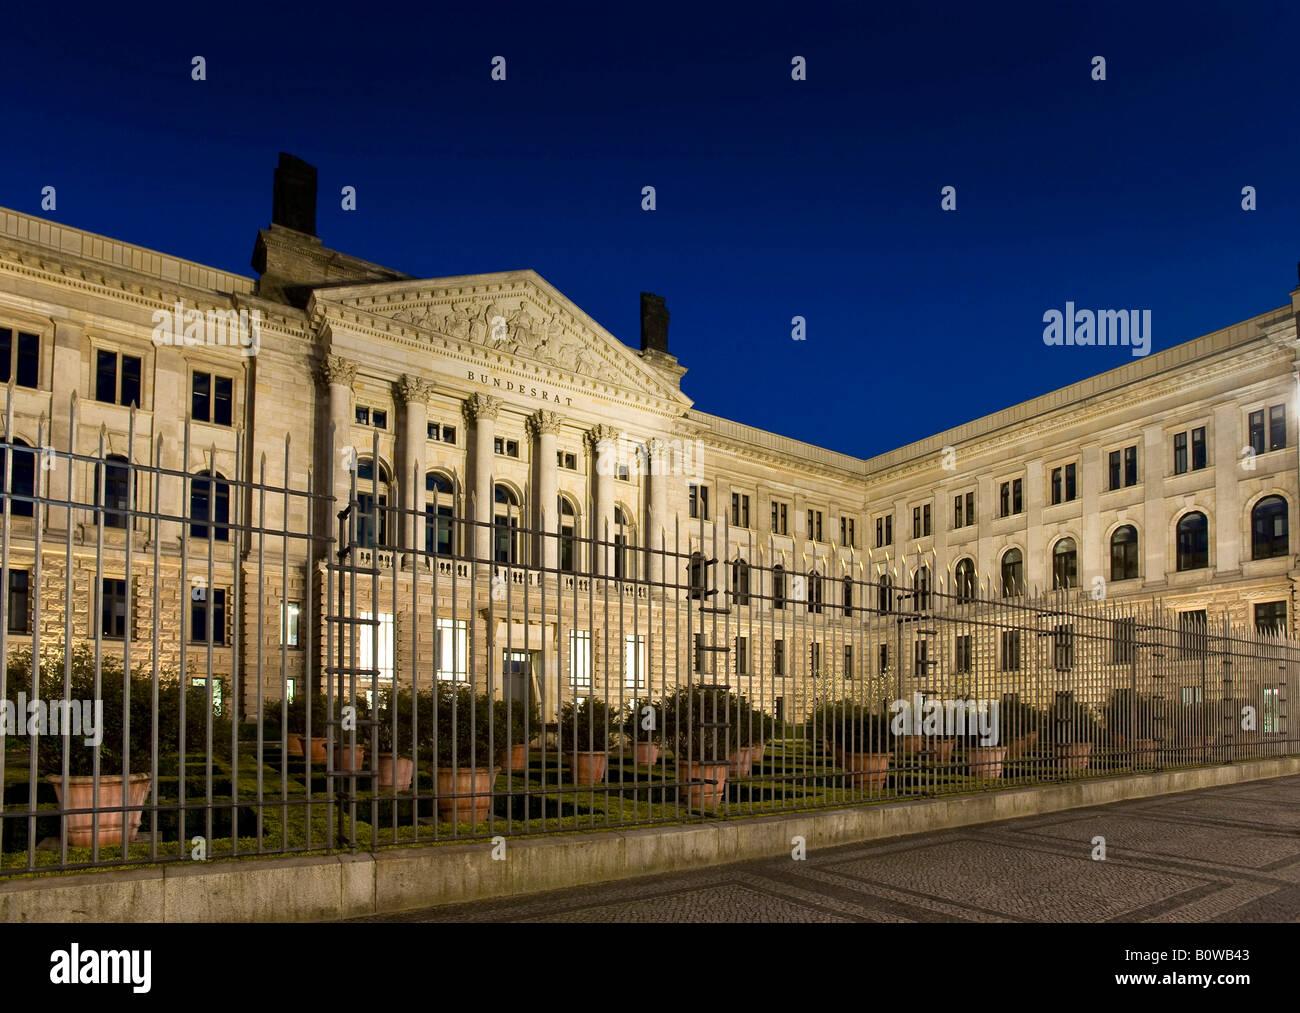 Bundesrat, Federal Council, Berlin, Germany - Stock Image